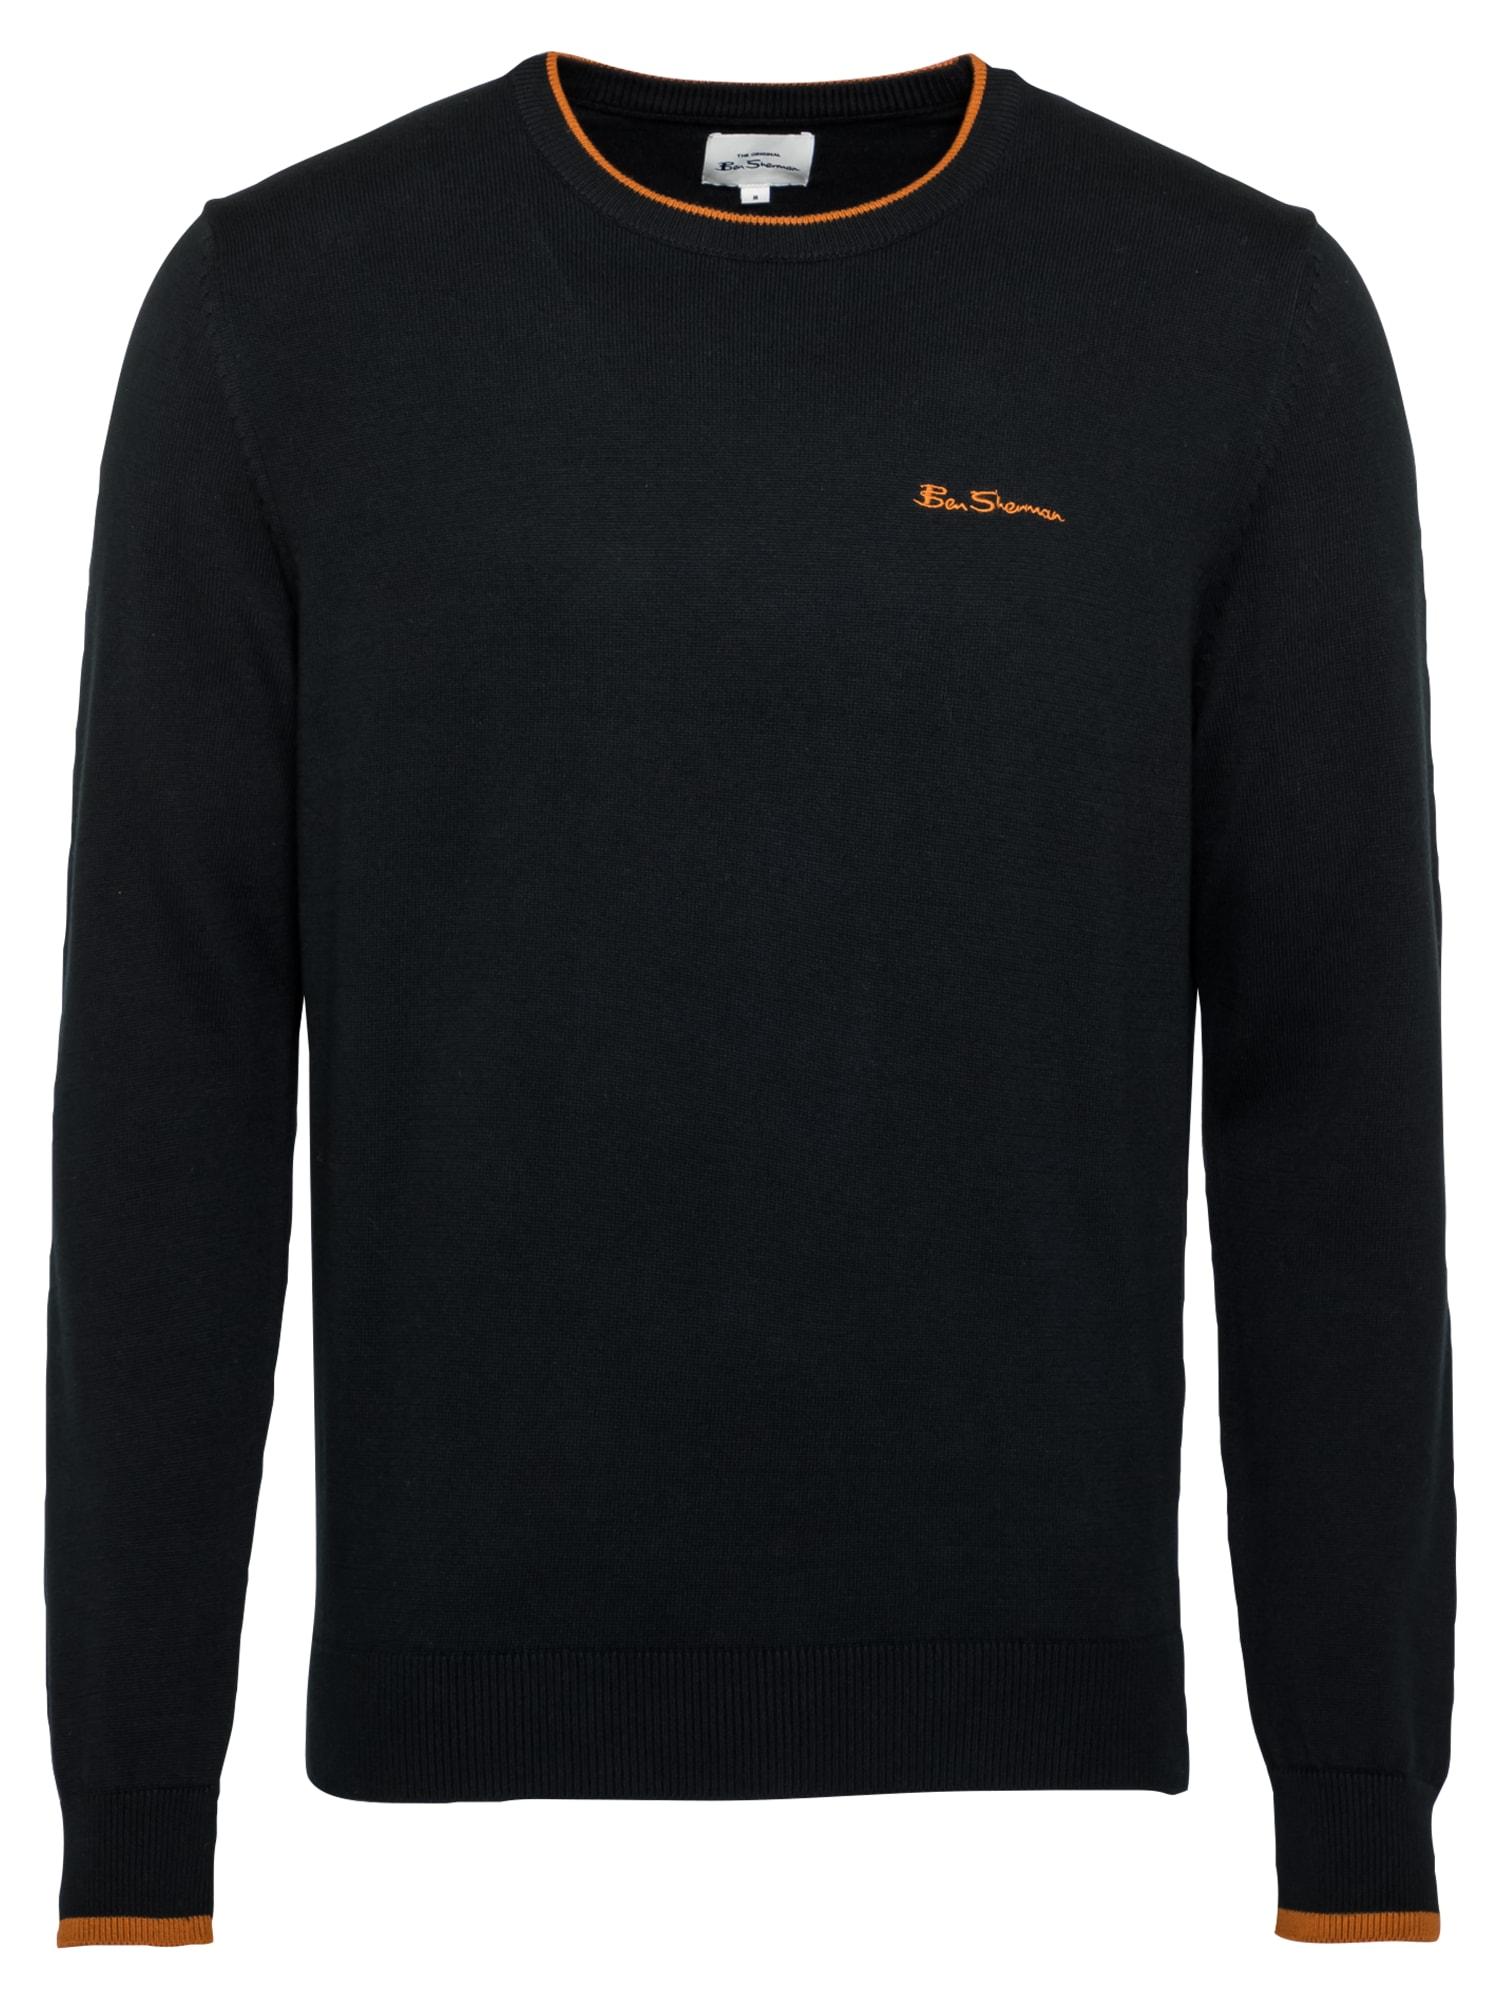 Ben Sherman Megztinis juoda / oranžinė